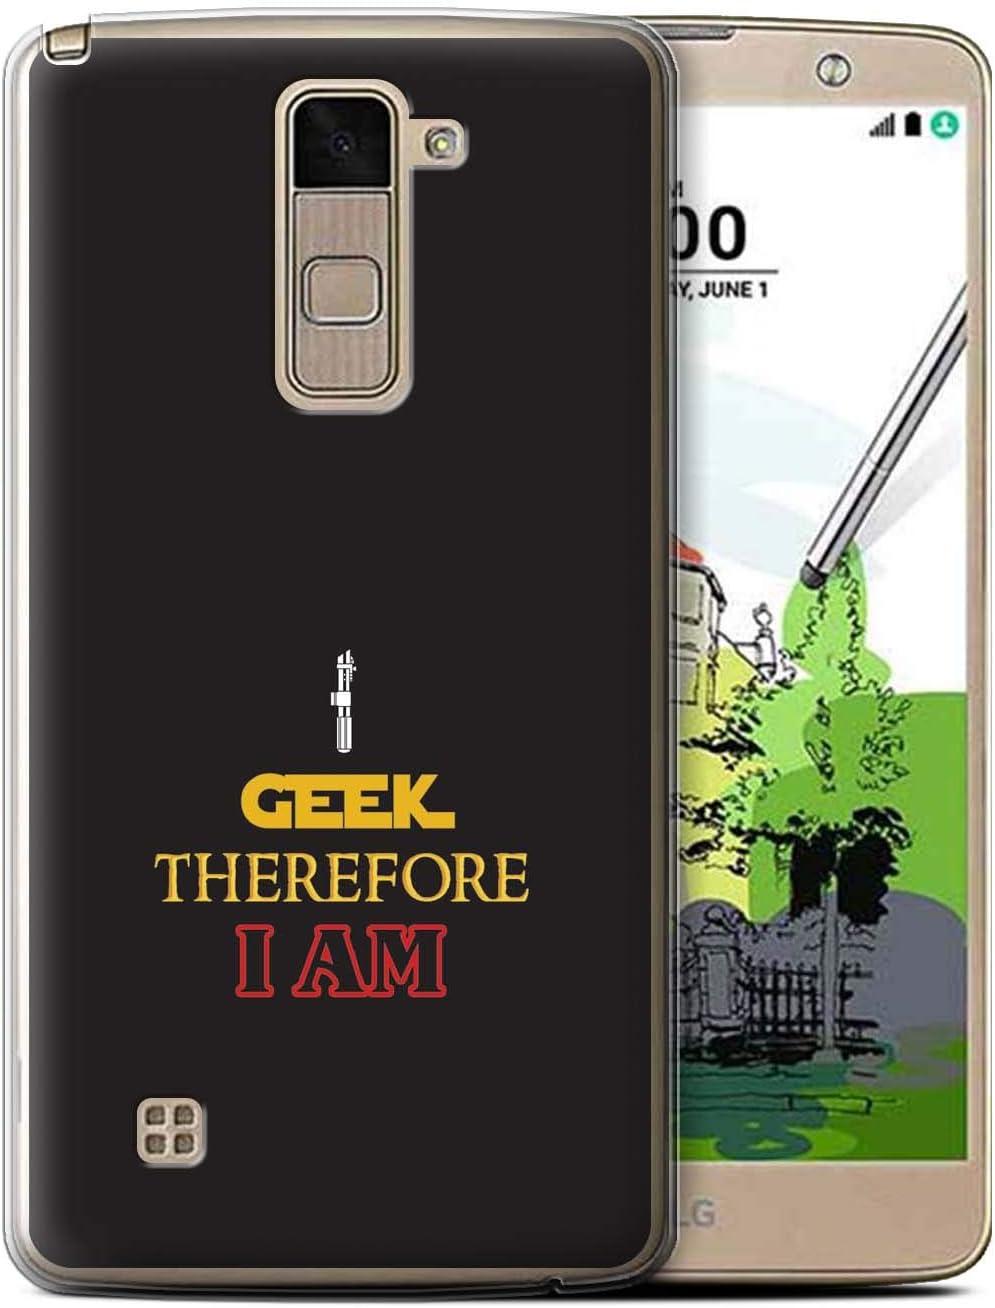 Phone Case for LG Stylo 2 Plus/MS550/K535 Geek Nerdy Gamer Fan I Am Geek Design Transparent Clear Ultra Soft Flexi Silicone Gel/TPU Bumper Cover